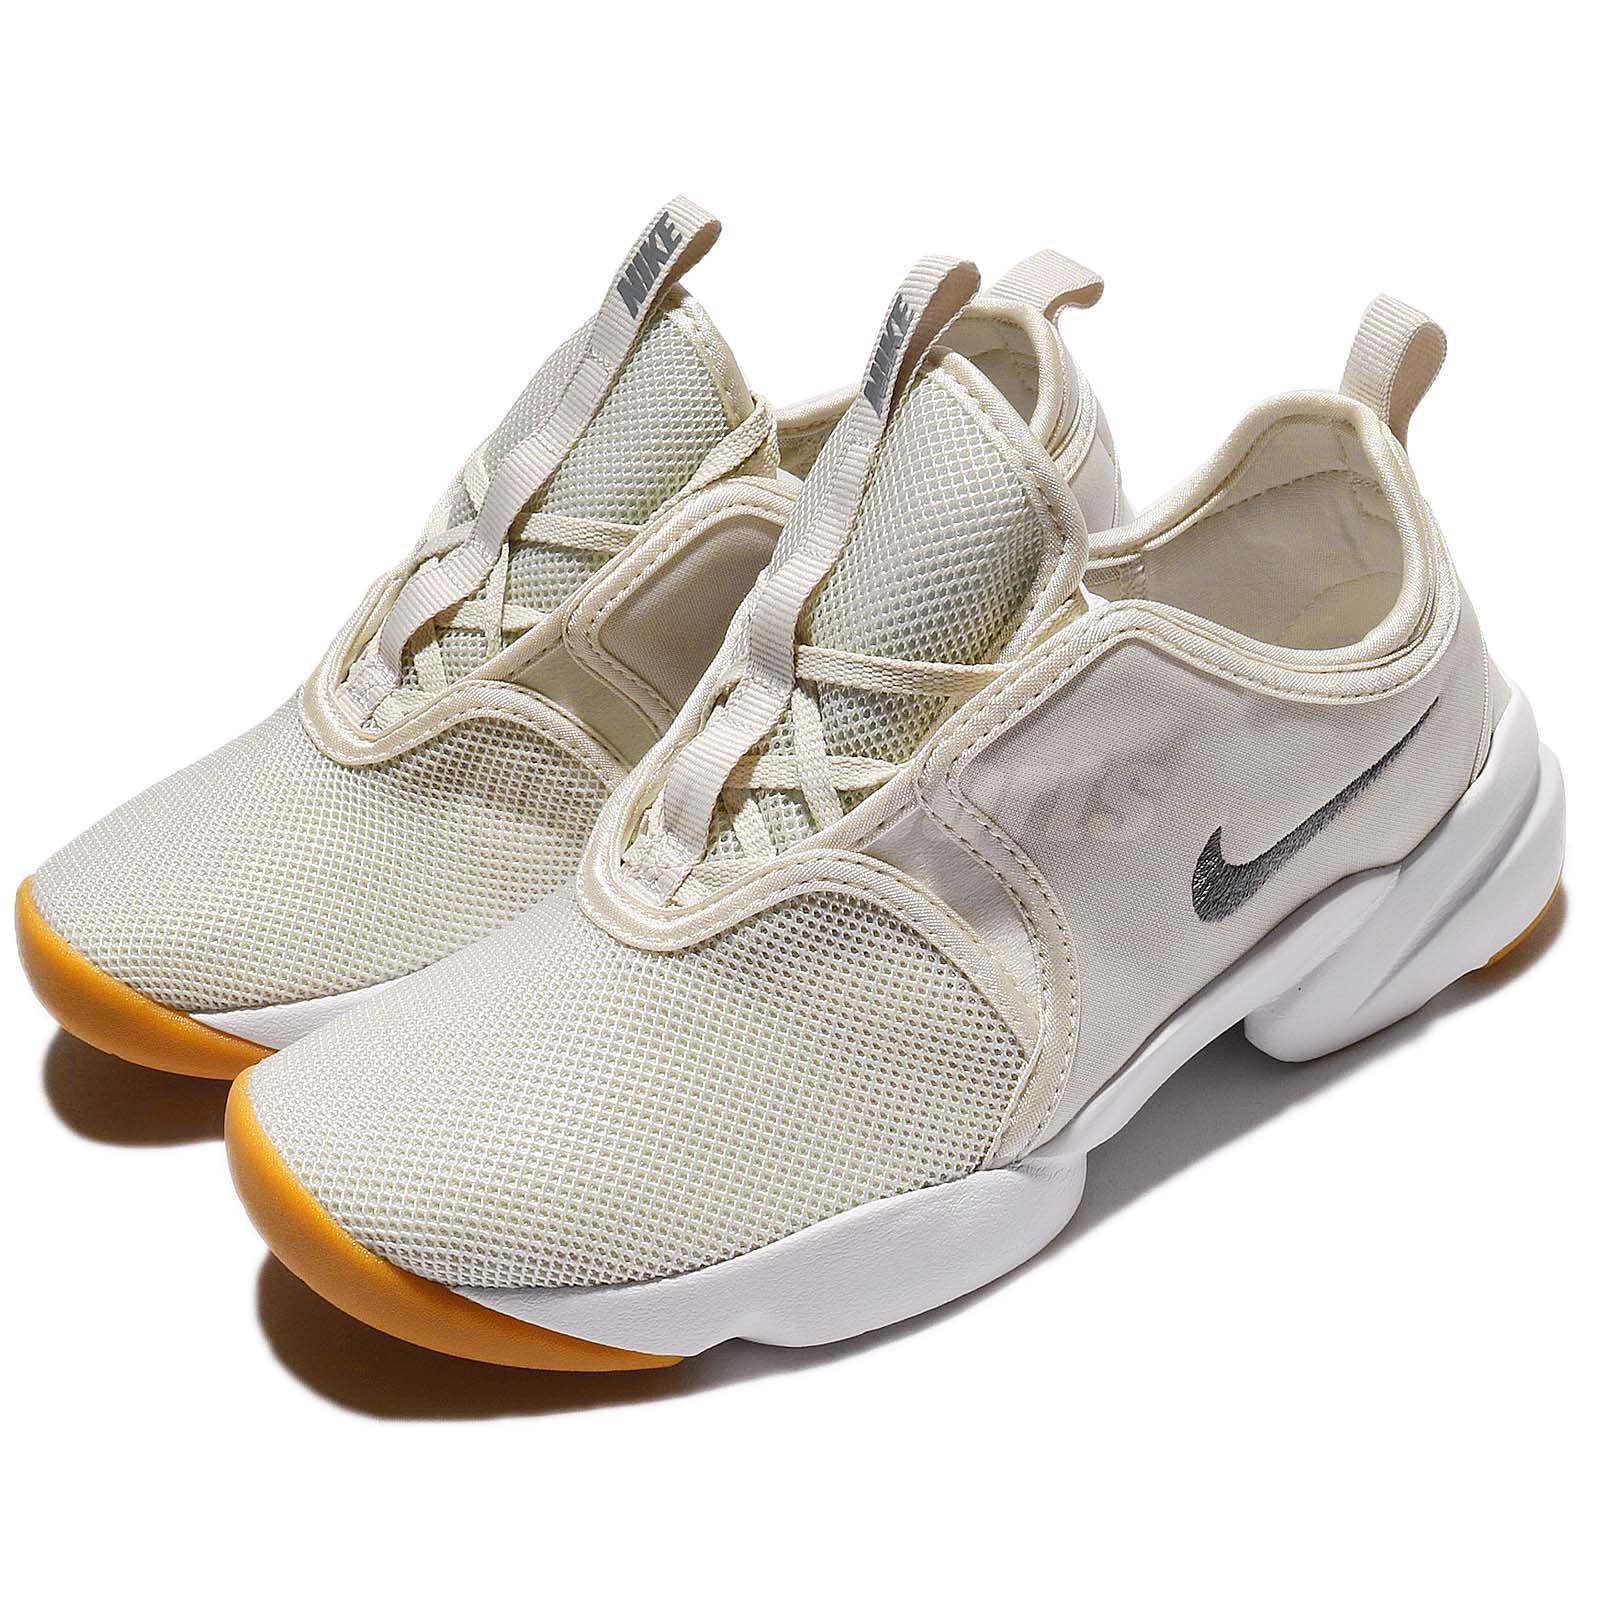 Wmns zapatos Nike Loden Light Bone Gum mujer Running zapatos Wmns zapatillas 896298-008 de2ab6